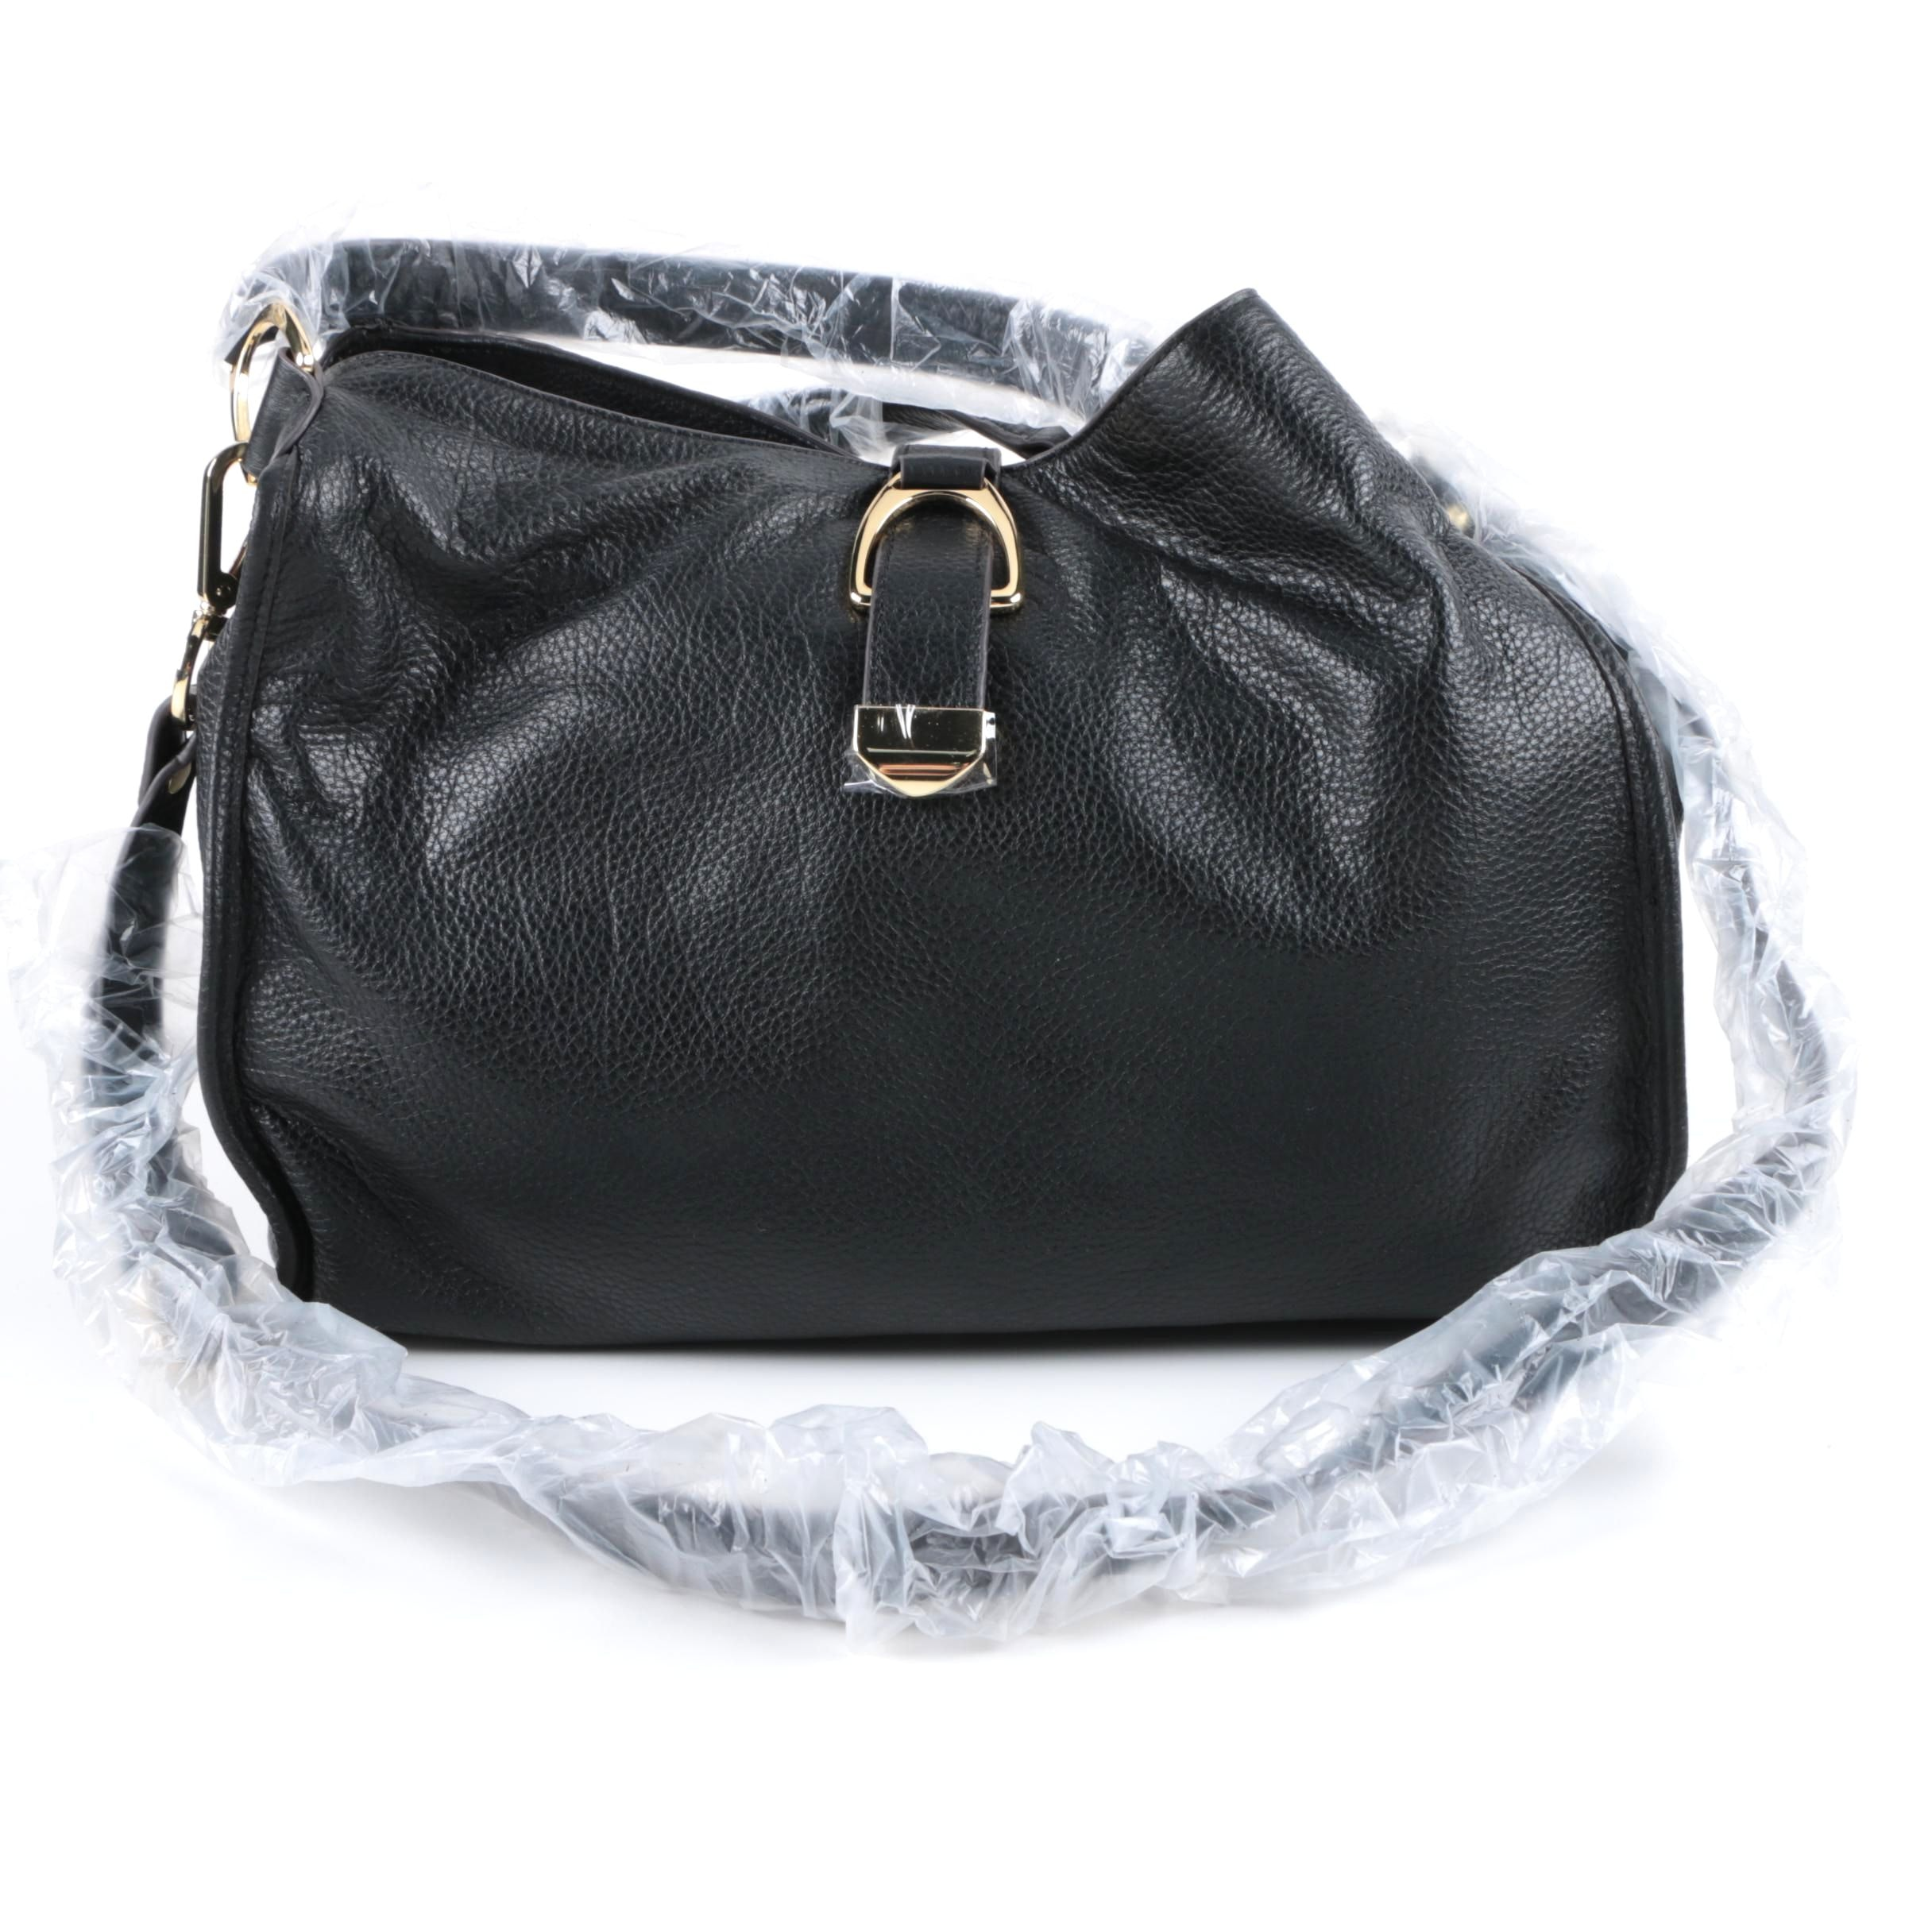 G.I.L.I. Got It Love It Leather Handbag